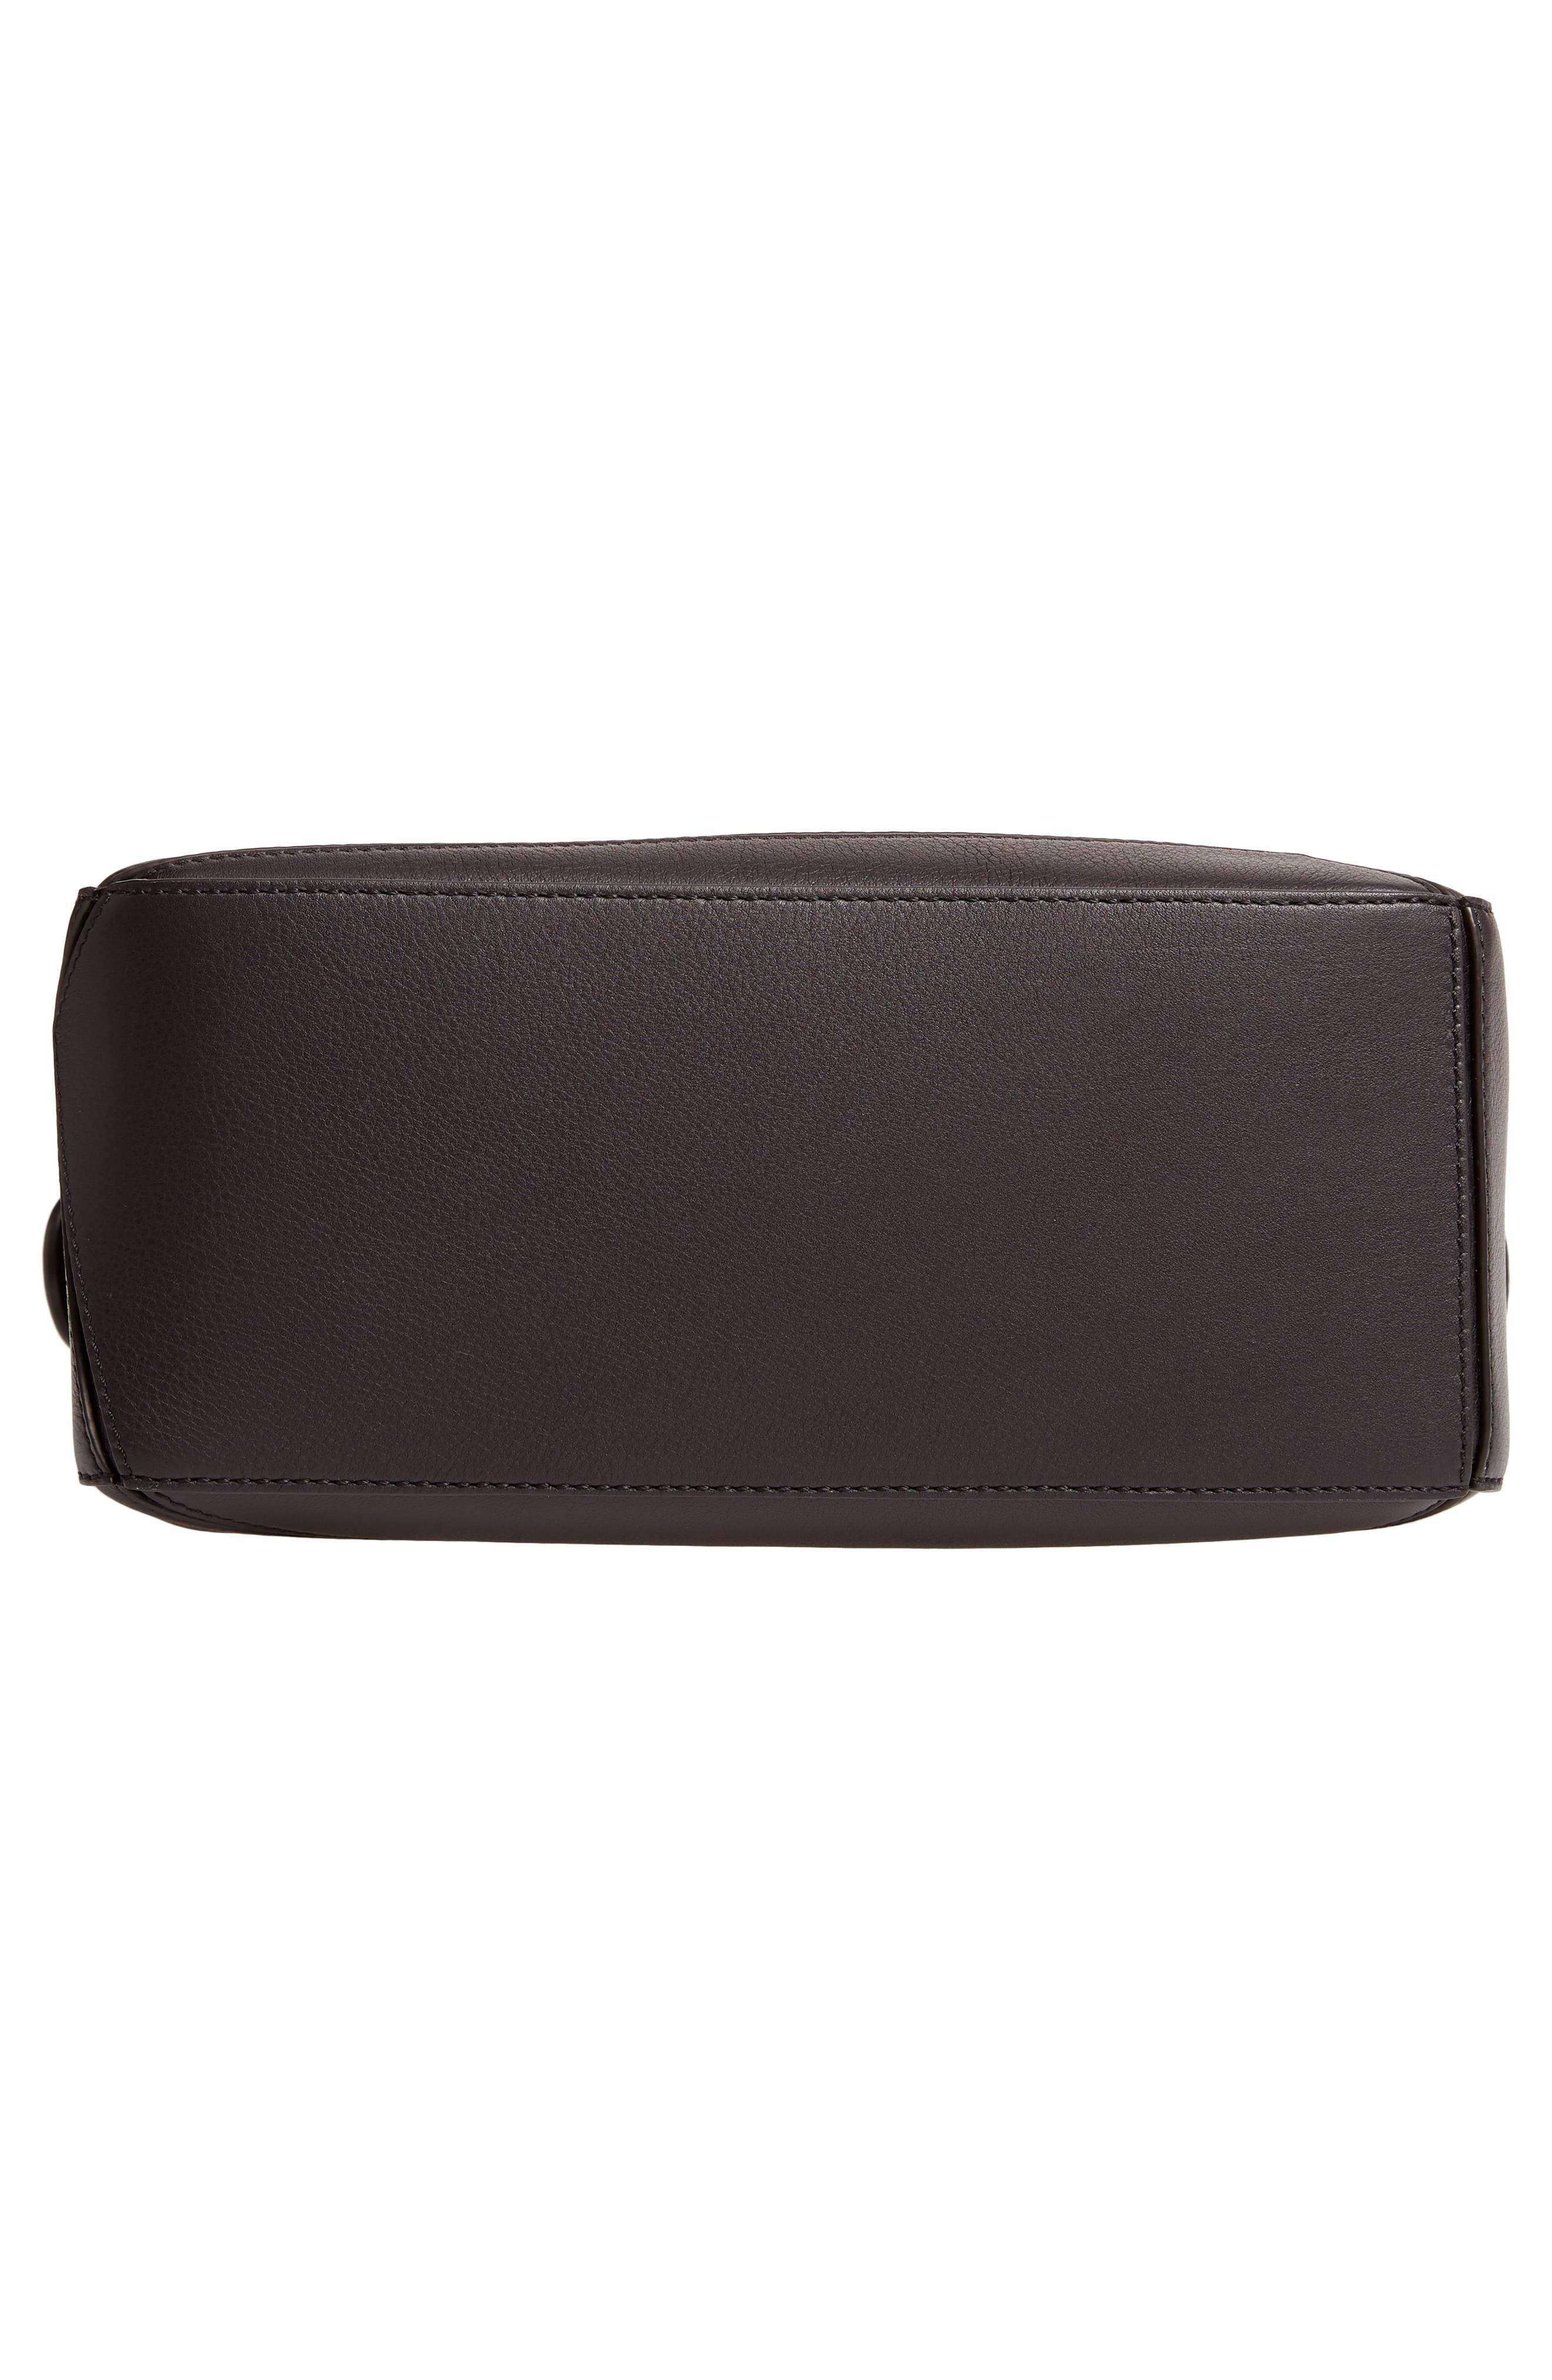 Small Puzzle Shoulder Bag,                             Alternate thumbnail 6, color,                             BLACK